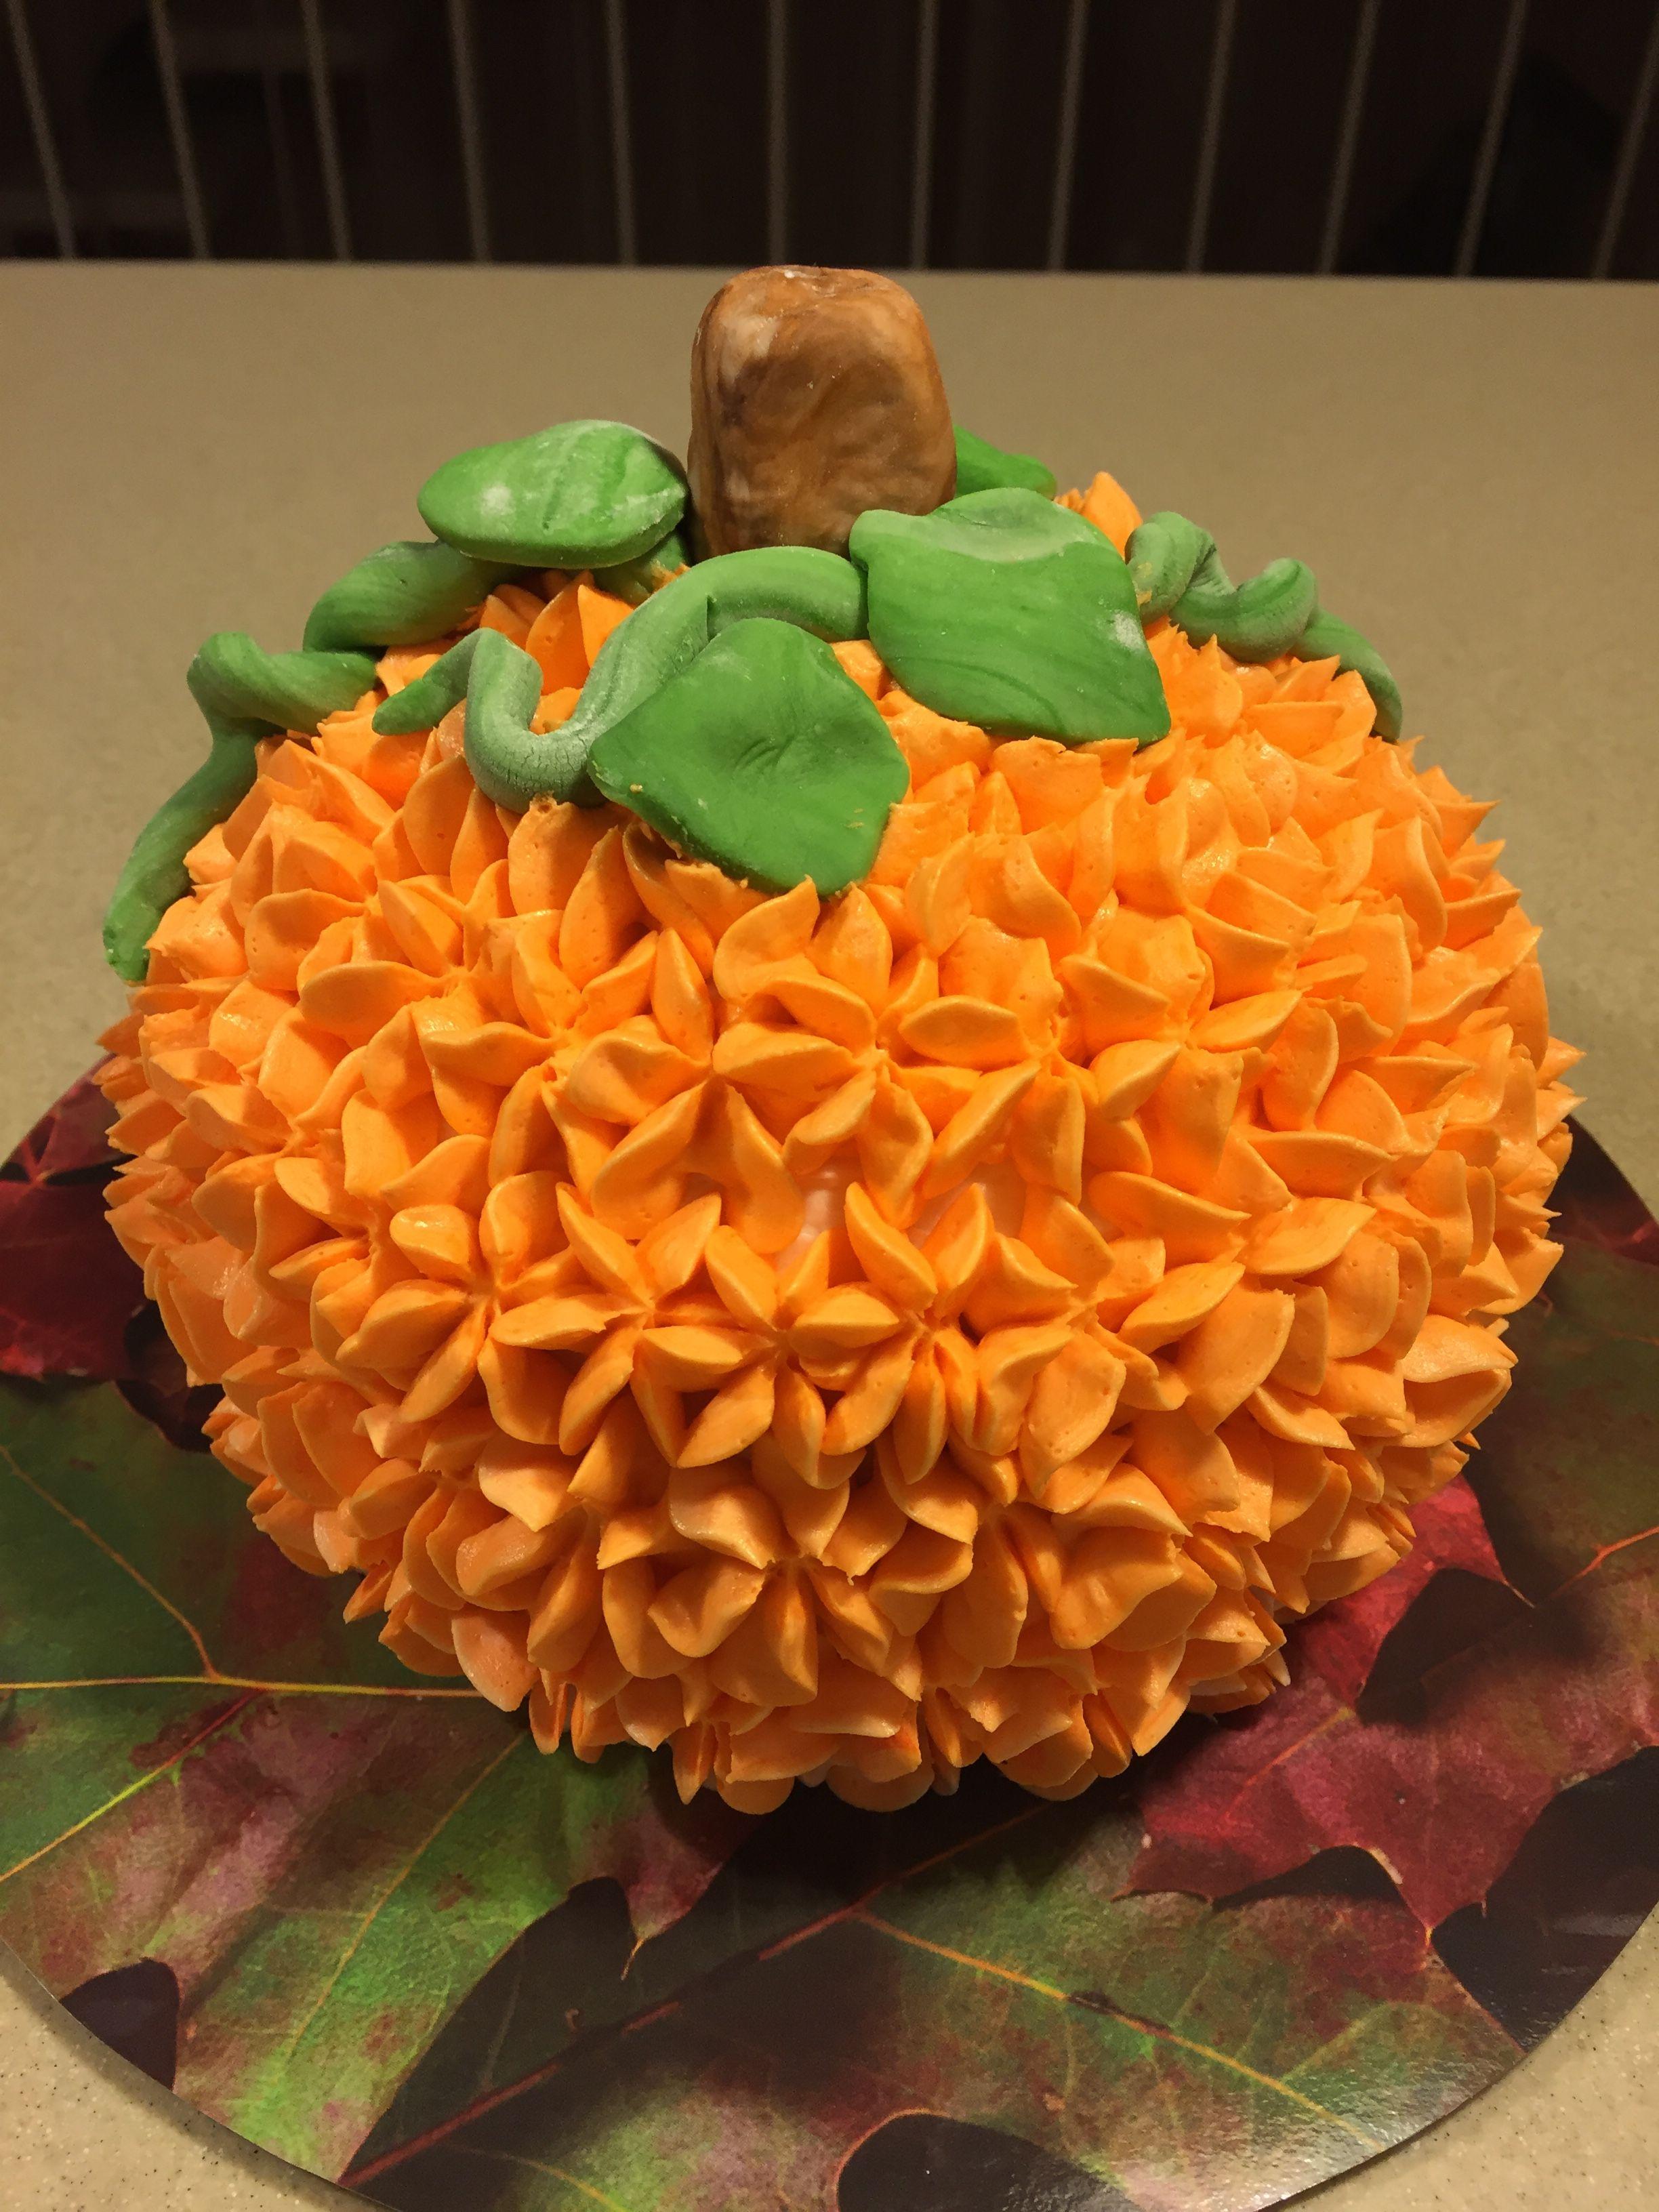 Phenomenal Pumpkin Smash Cake For My Great Nephews First Birthday Pumpkin Funny Birthday Cards Online Alyptdamsfinfo